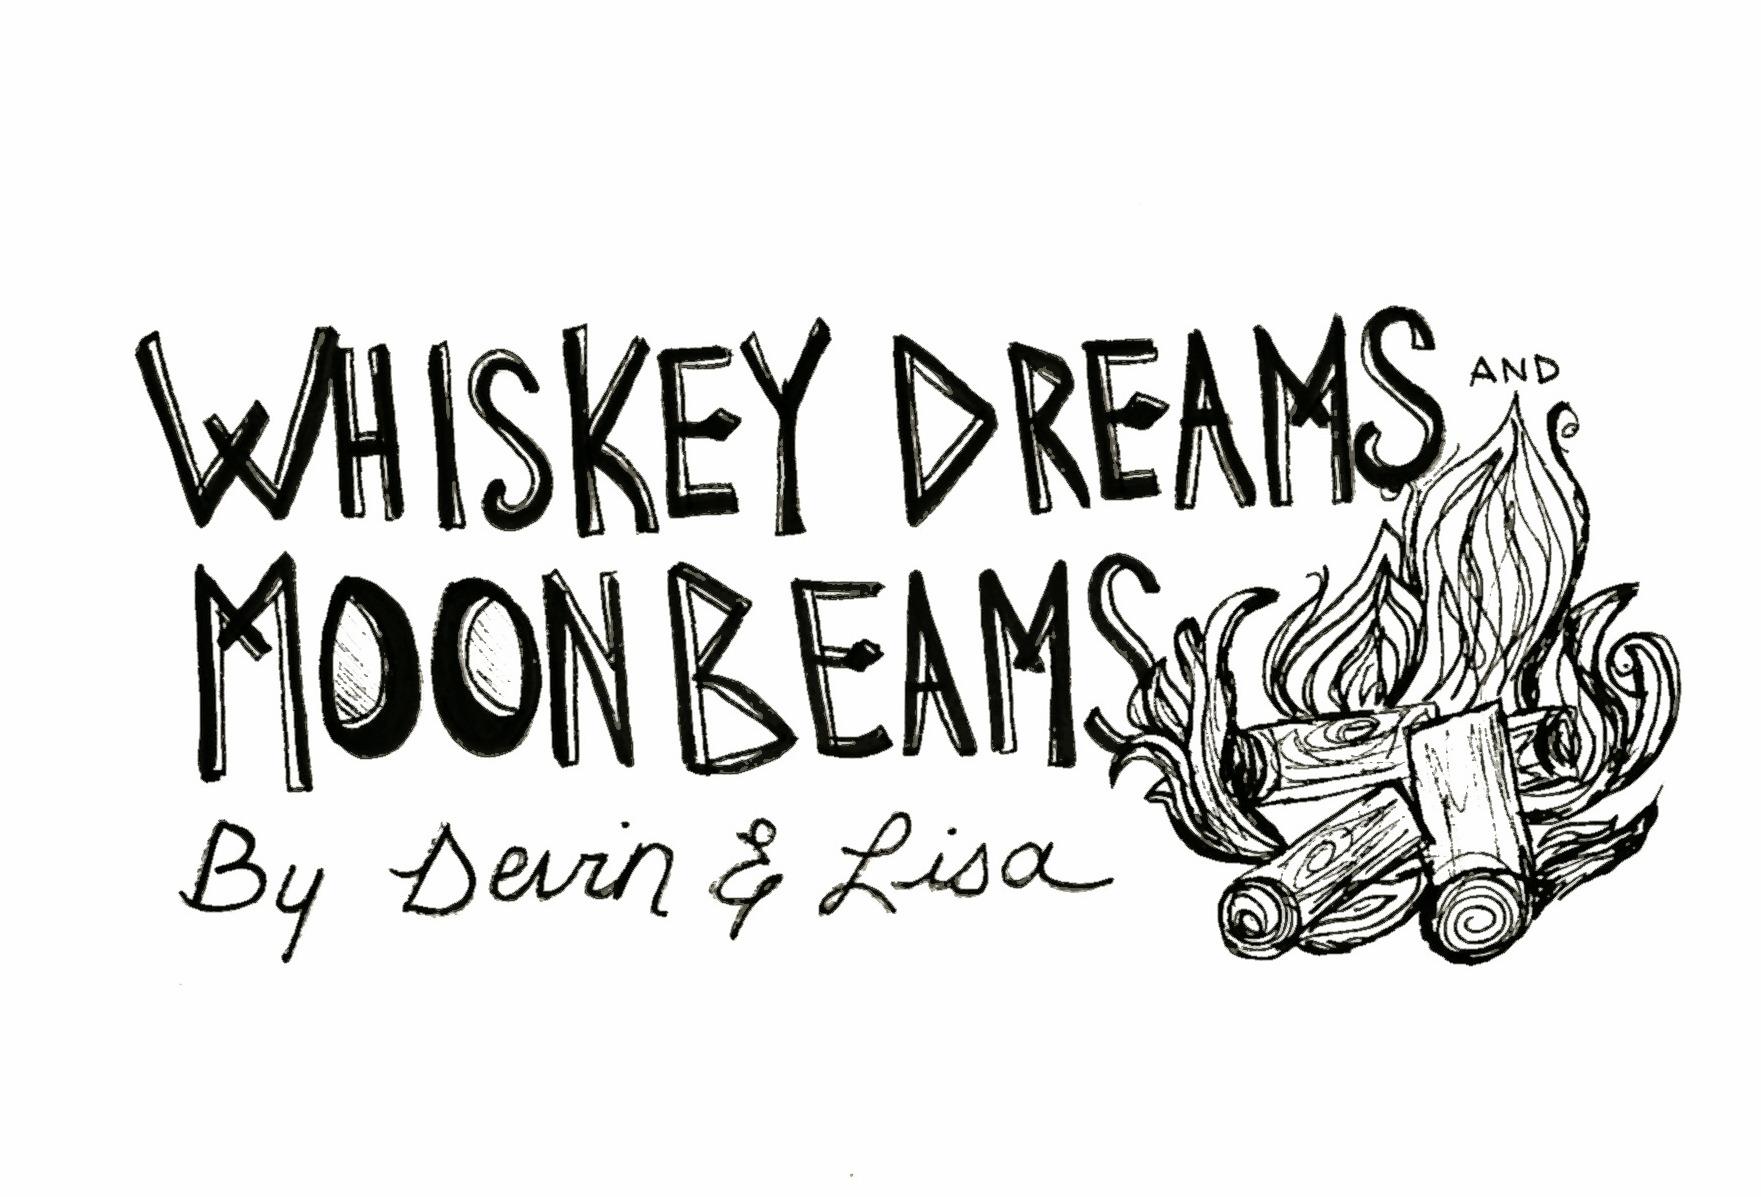 whiskey dreams slogan.jpg